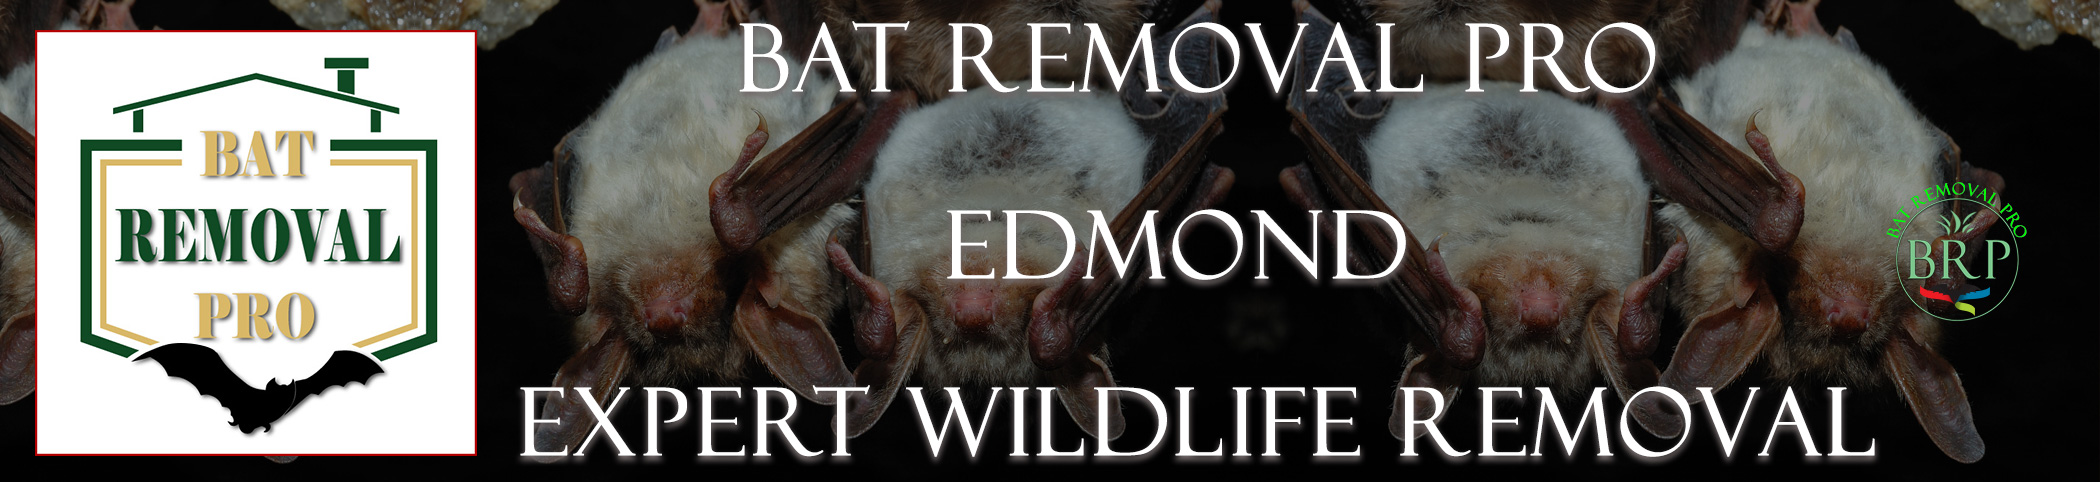 EDMOND-bat-removal-at-bat-removal-pro-header-image